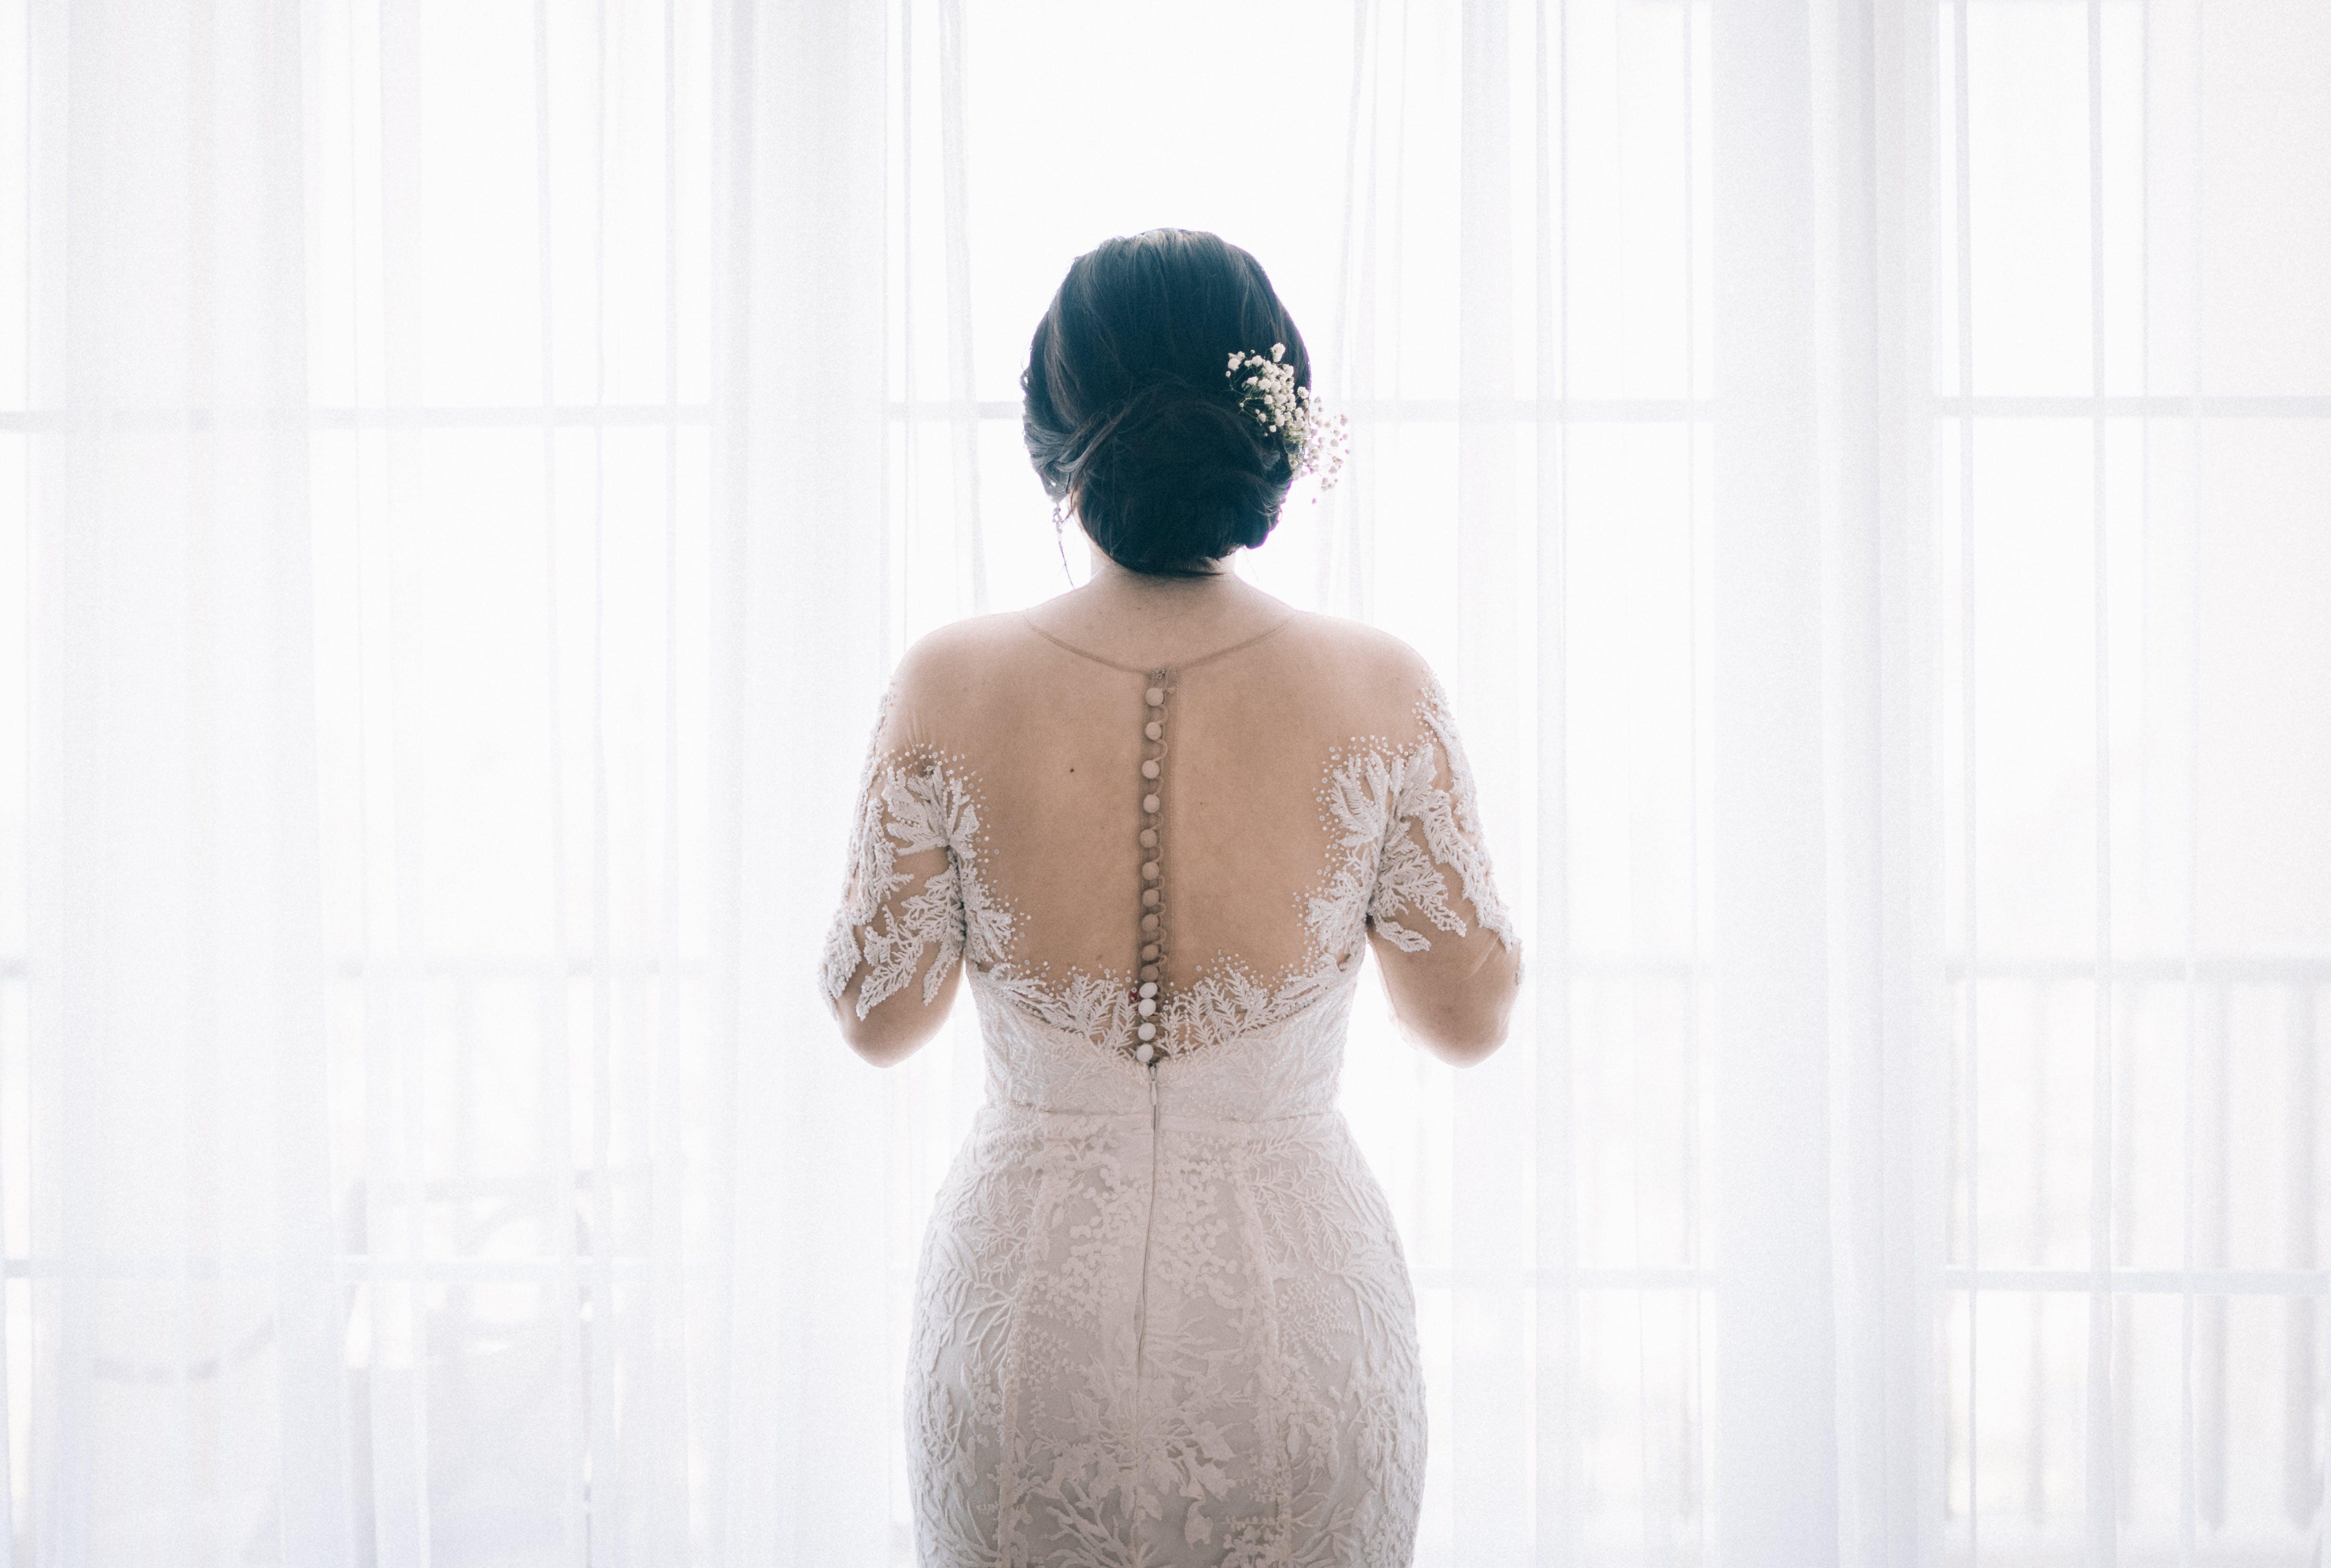 Gratis stockfoto met binnenshuis, bruid, bruidsjurk, close-up